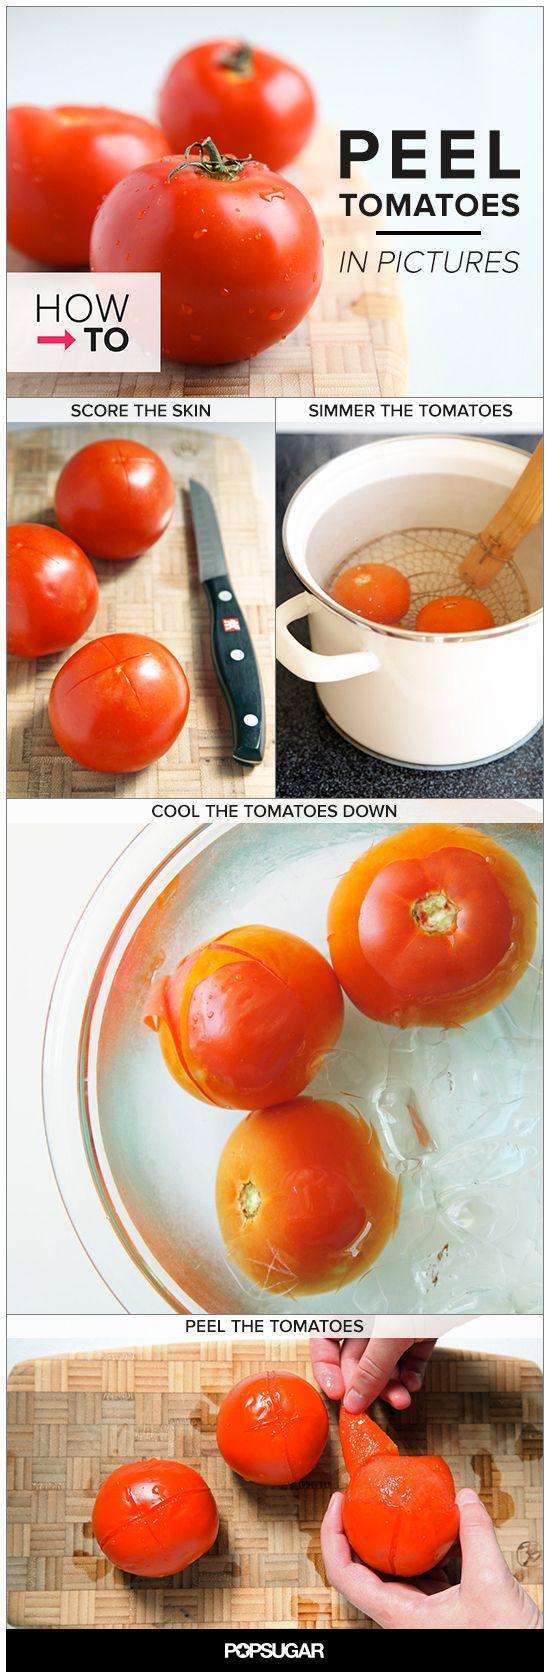 How to Easily Peel Tomatoes